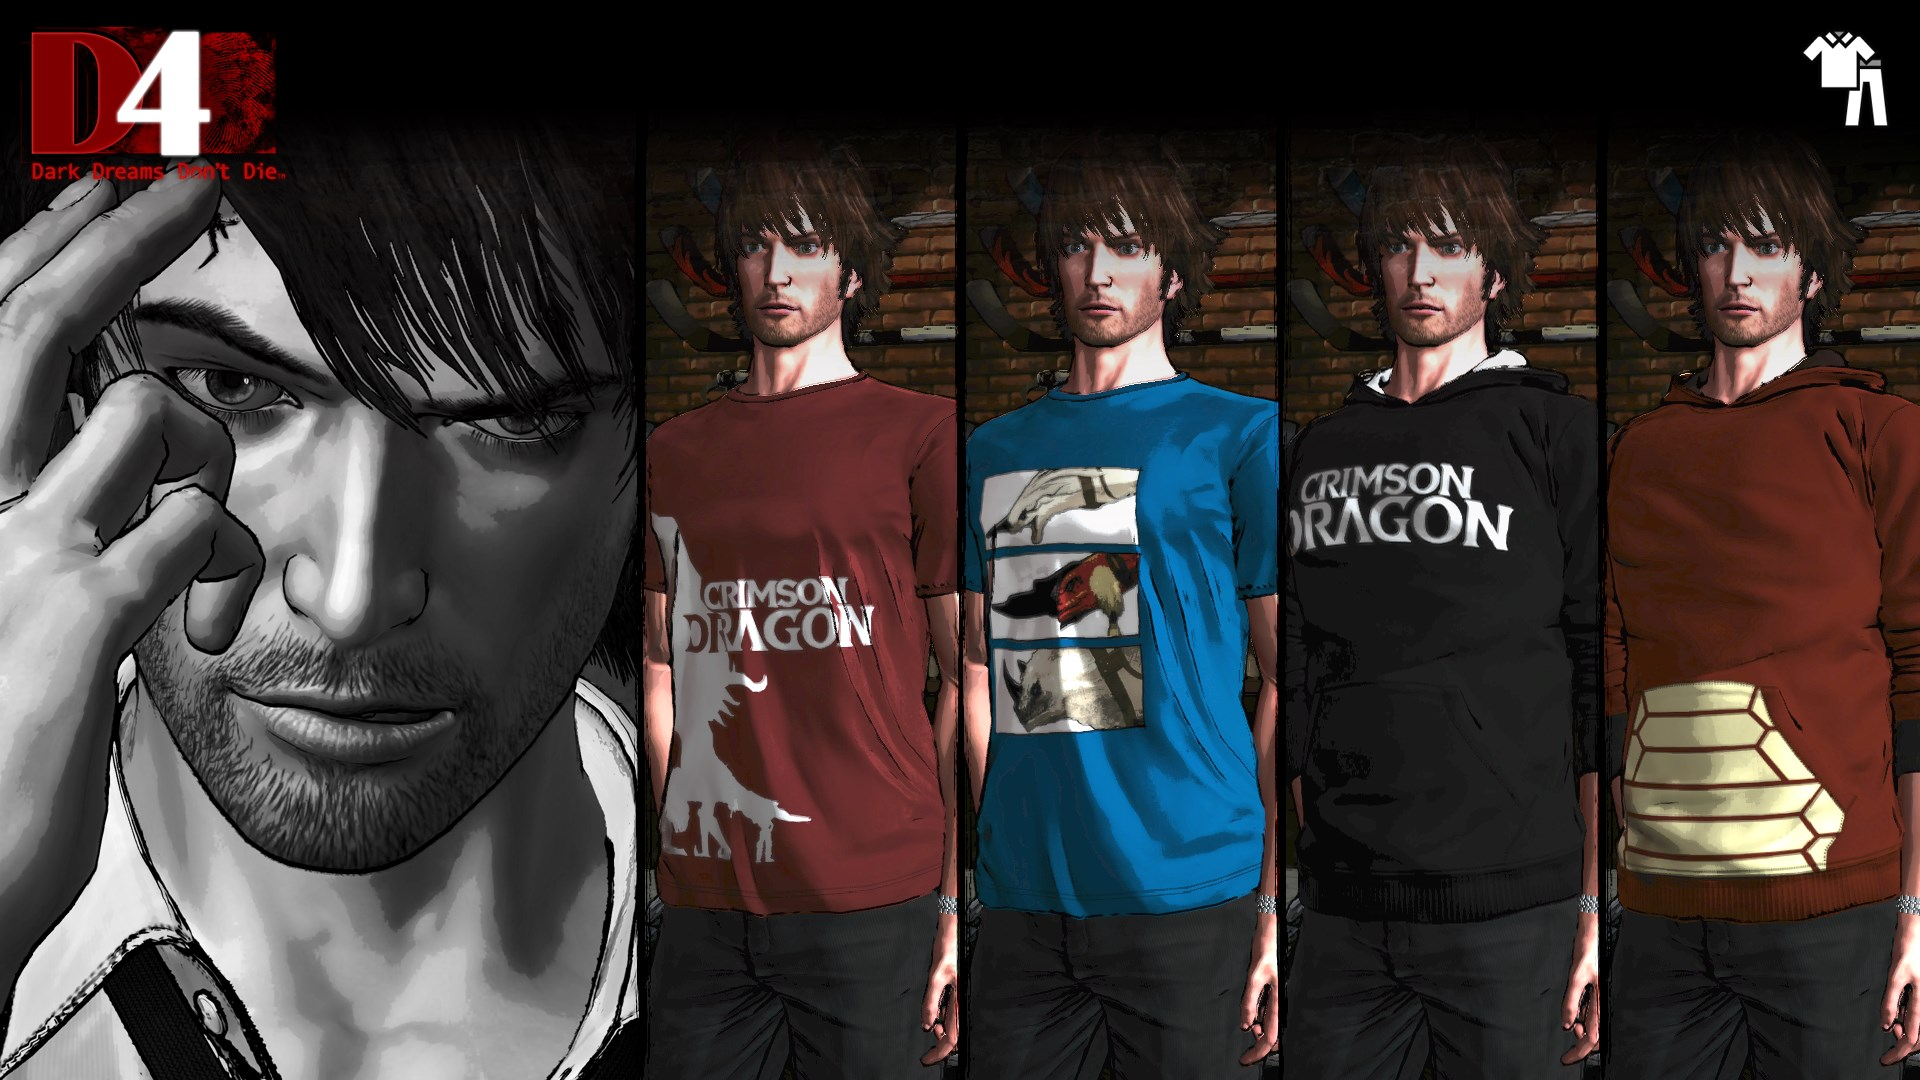 D4: Dark Dreams Don't Die - Crimson Dragon Clothing Set